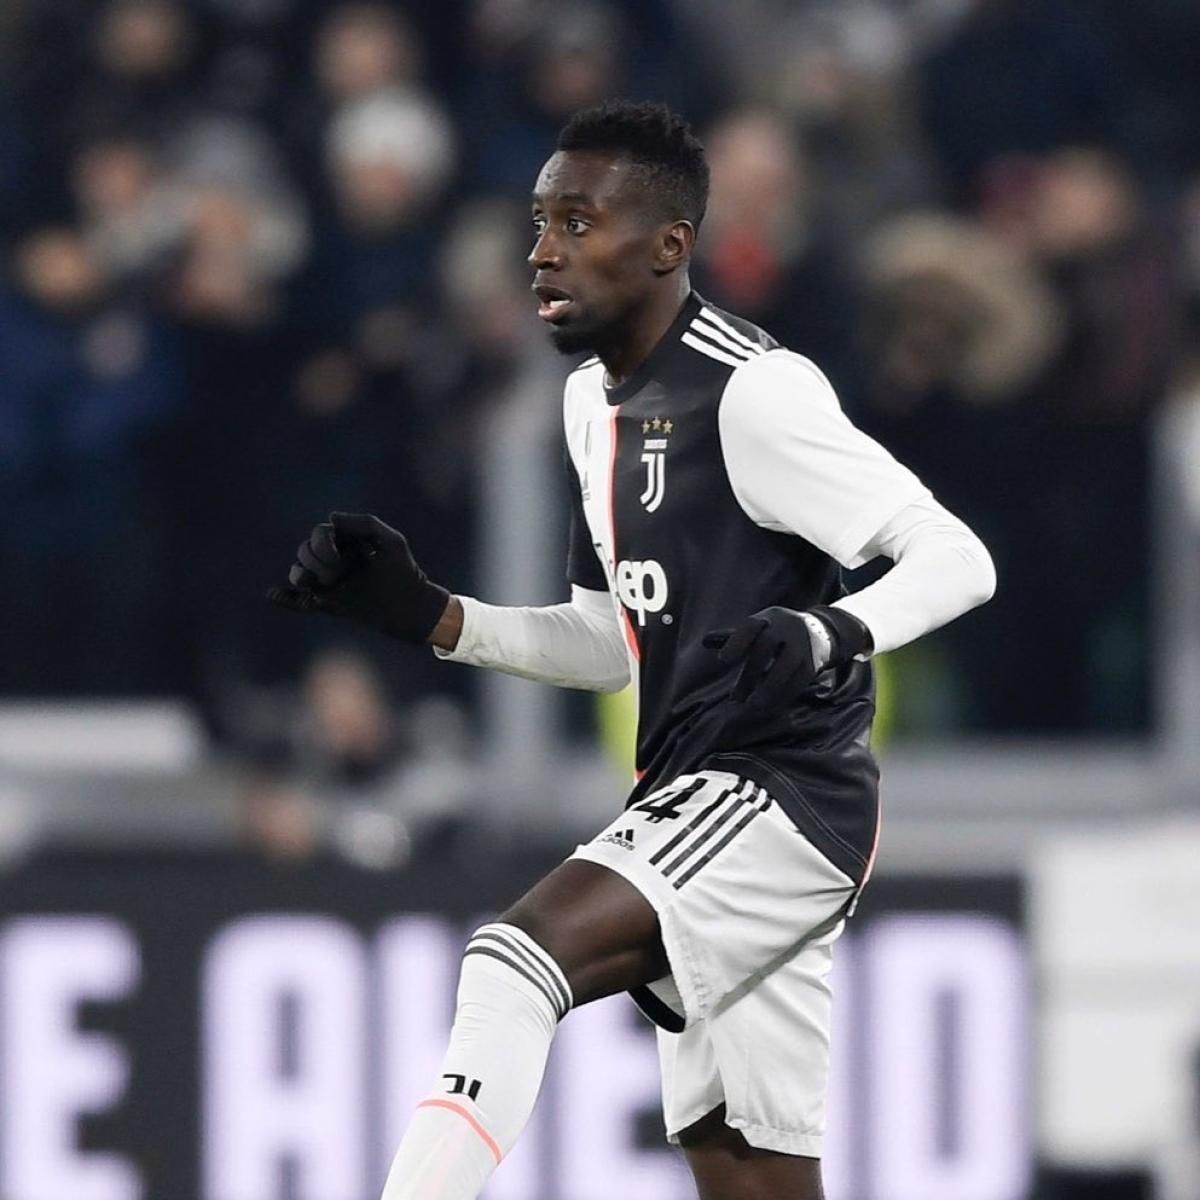 Coronavirus updates: France midfielder Blaise Matuidi becomes second Juventus footballer to fall victim to COVID-19